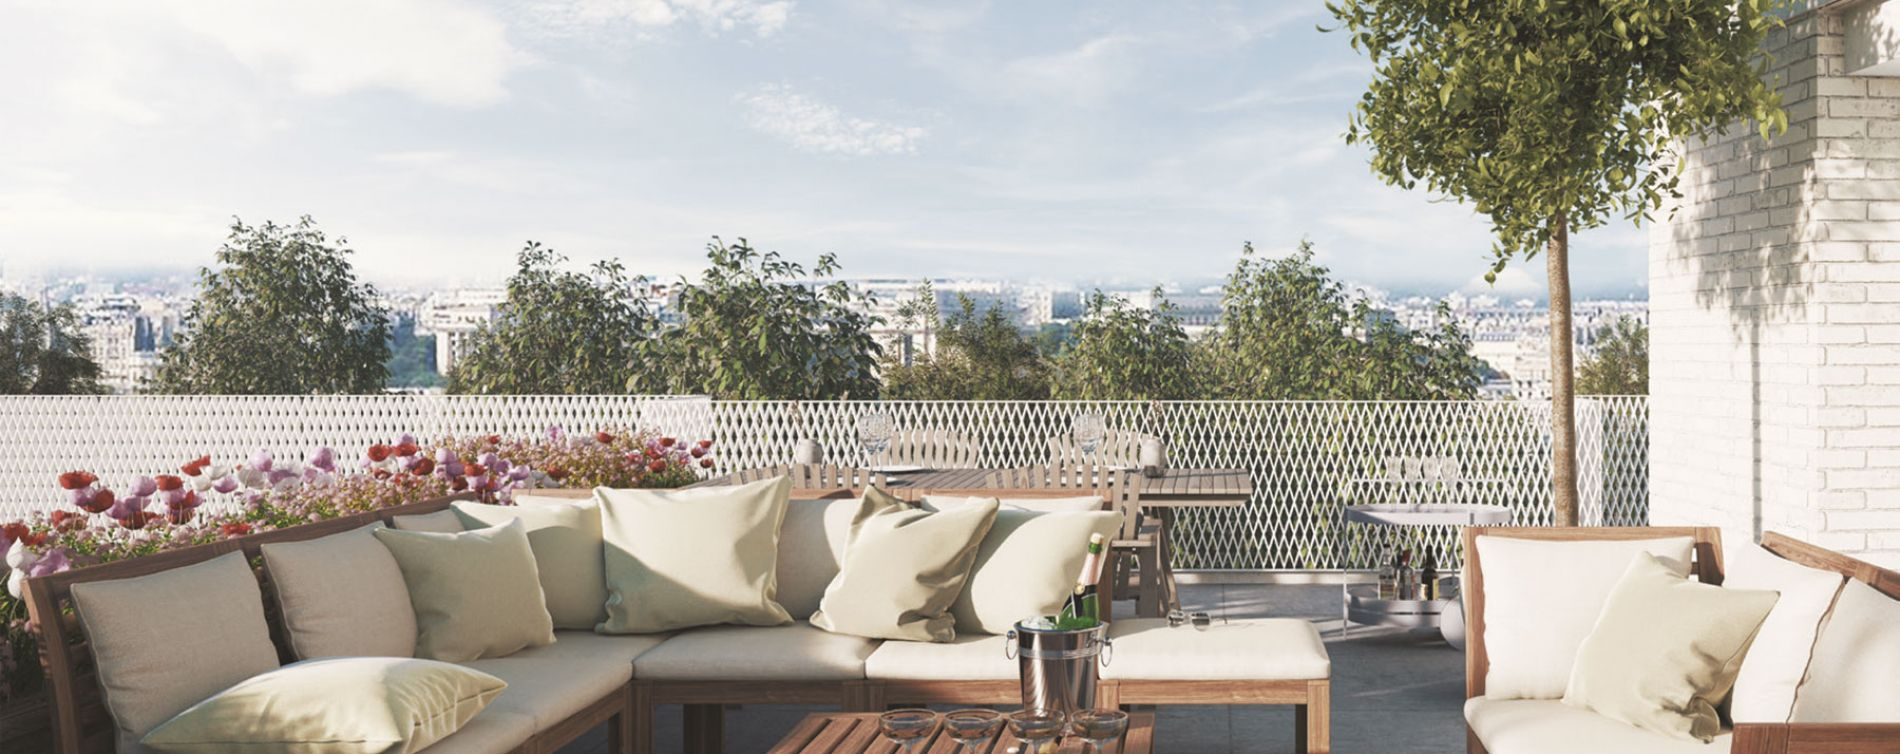 Villepinte : programme immobilier neuve « Greenwich » (3)